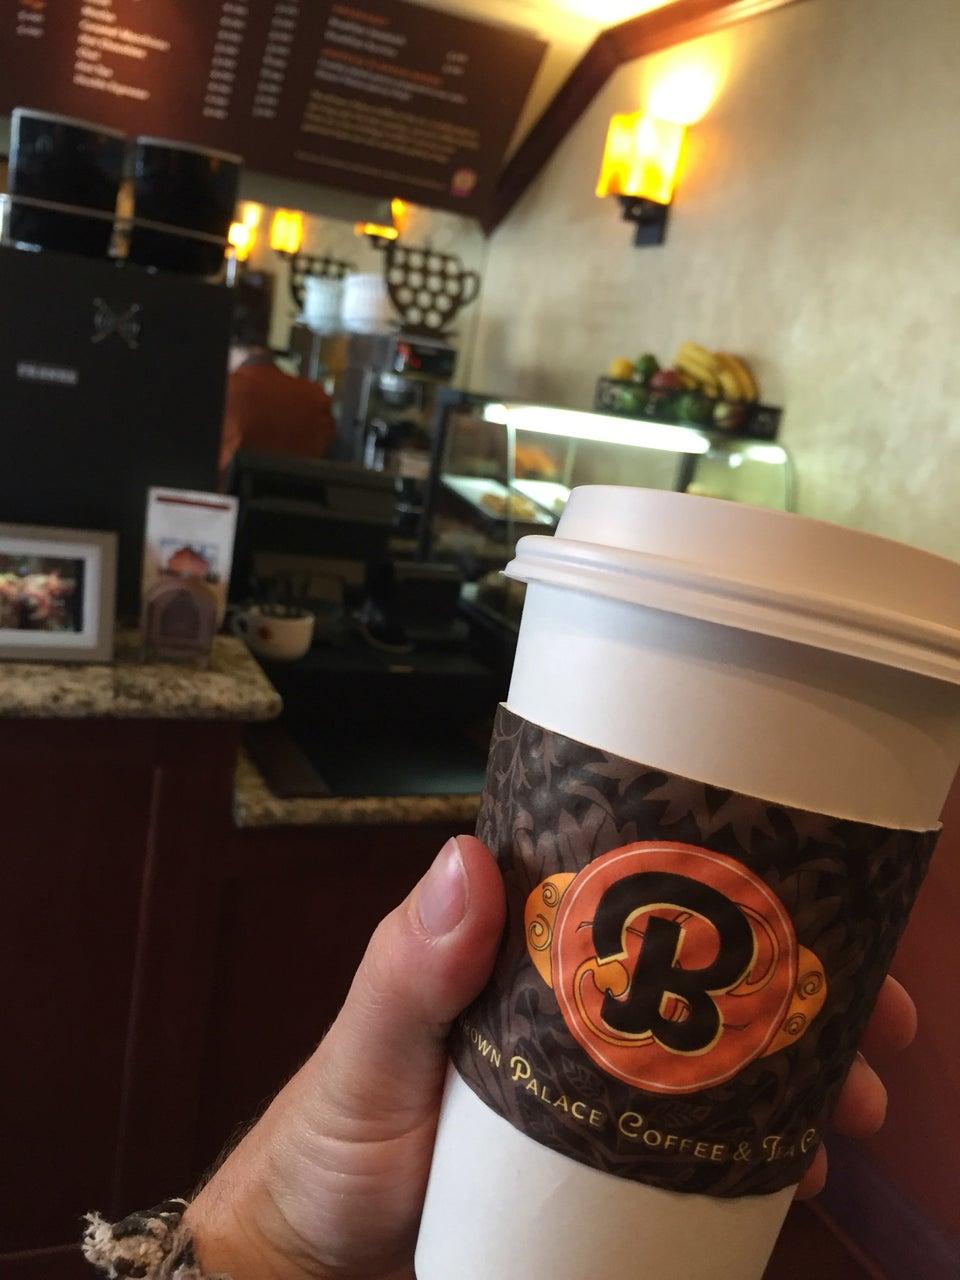 Brown Palace Coffee & Tea Co. 321 17th St, Denver